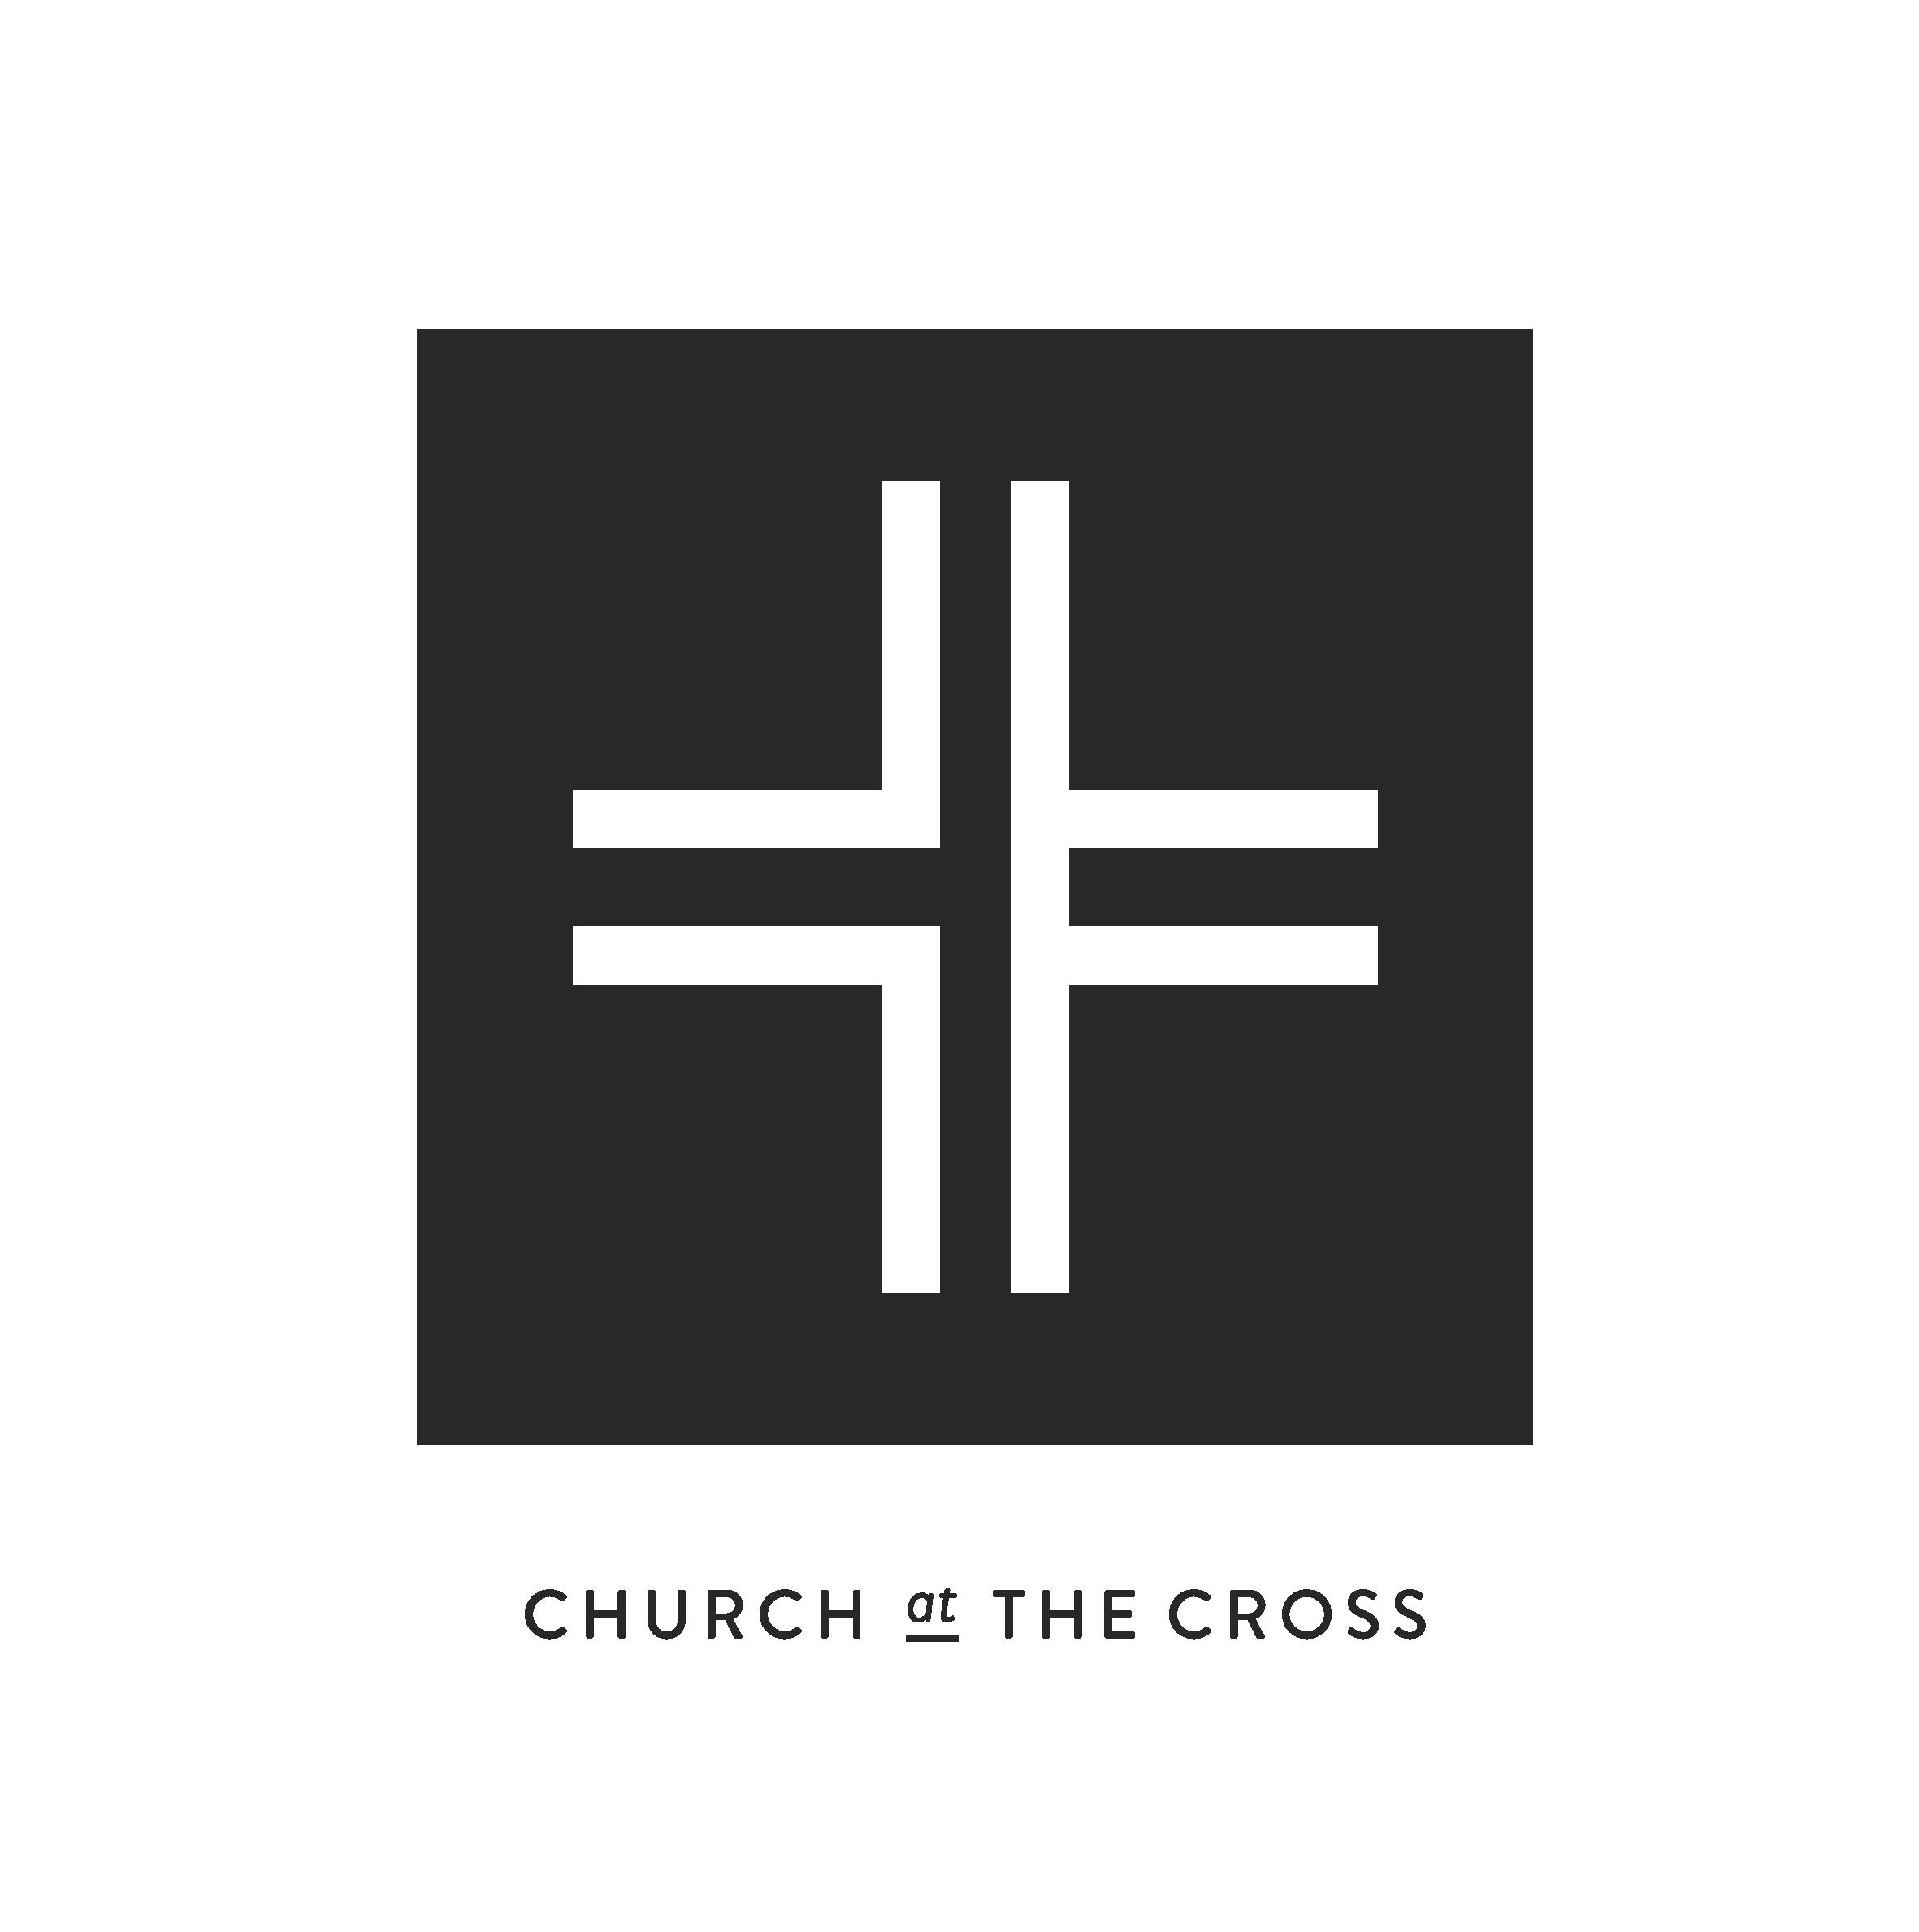 church_at_the_cross_branding-03.png